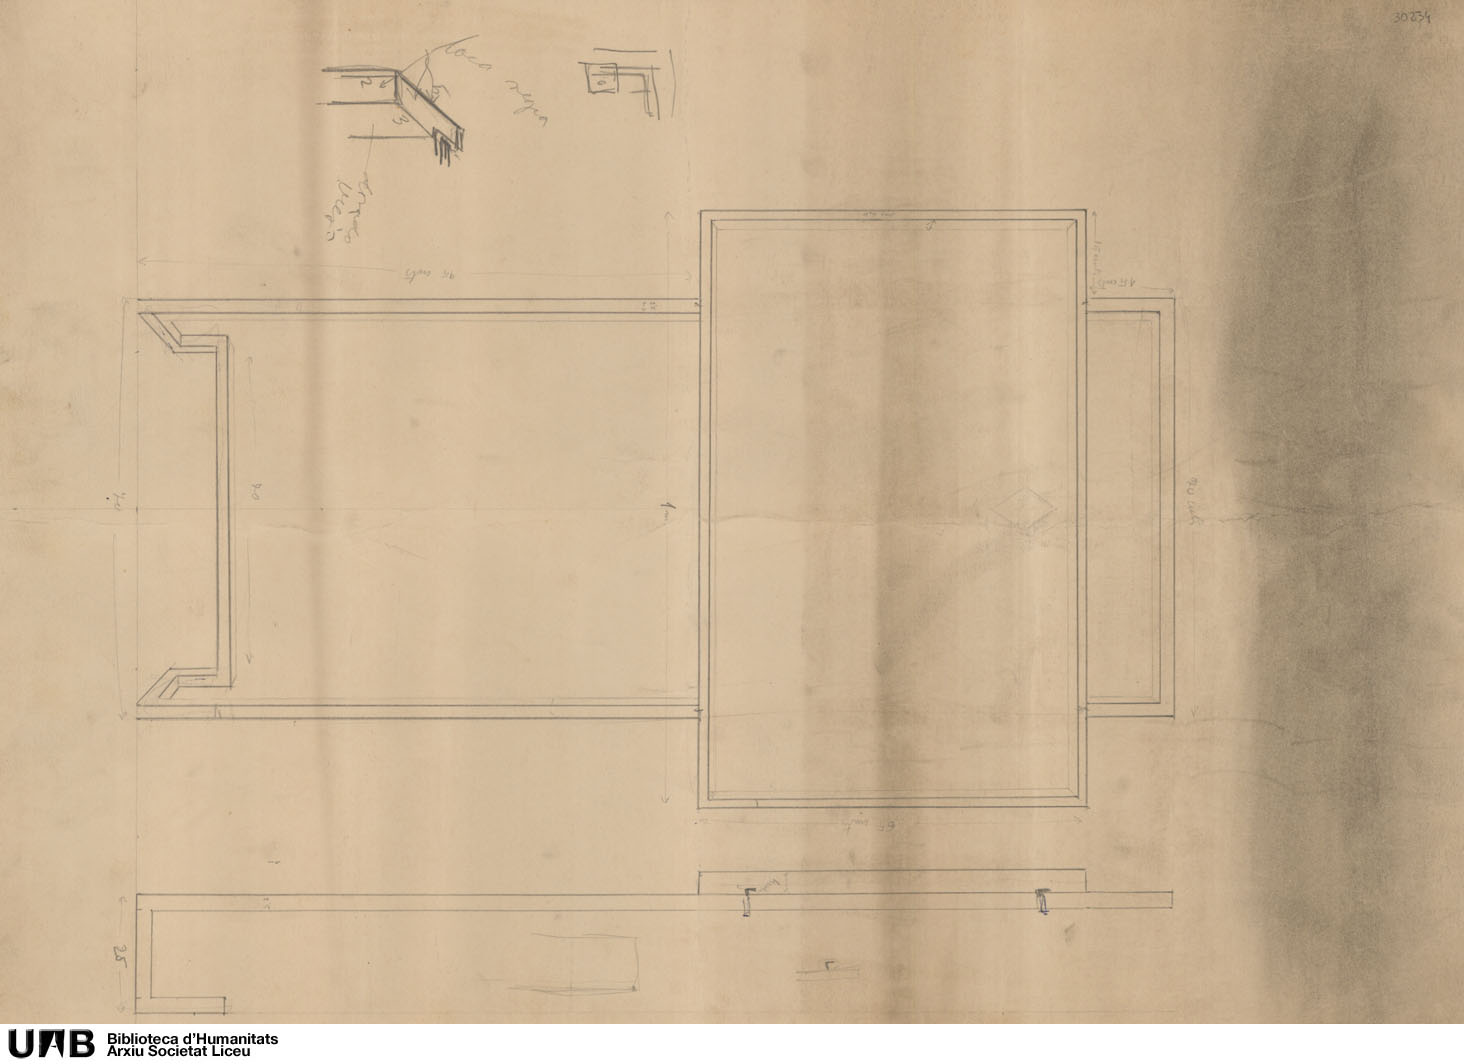 Estructura metálica para tablón